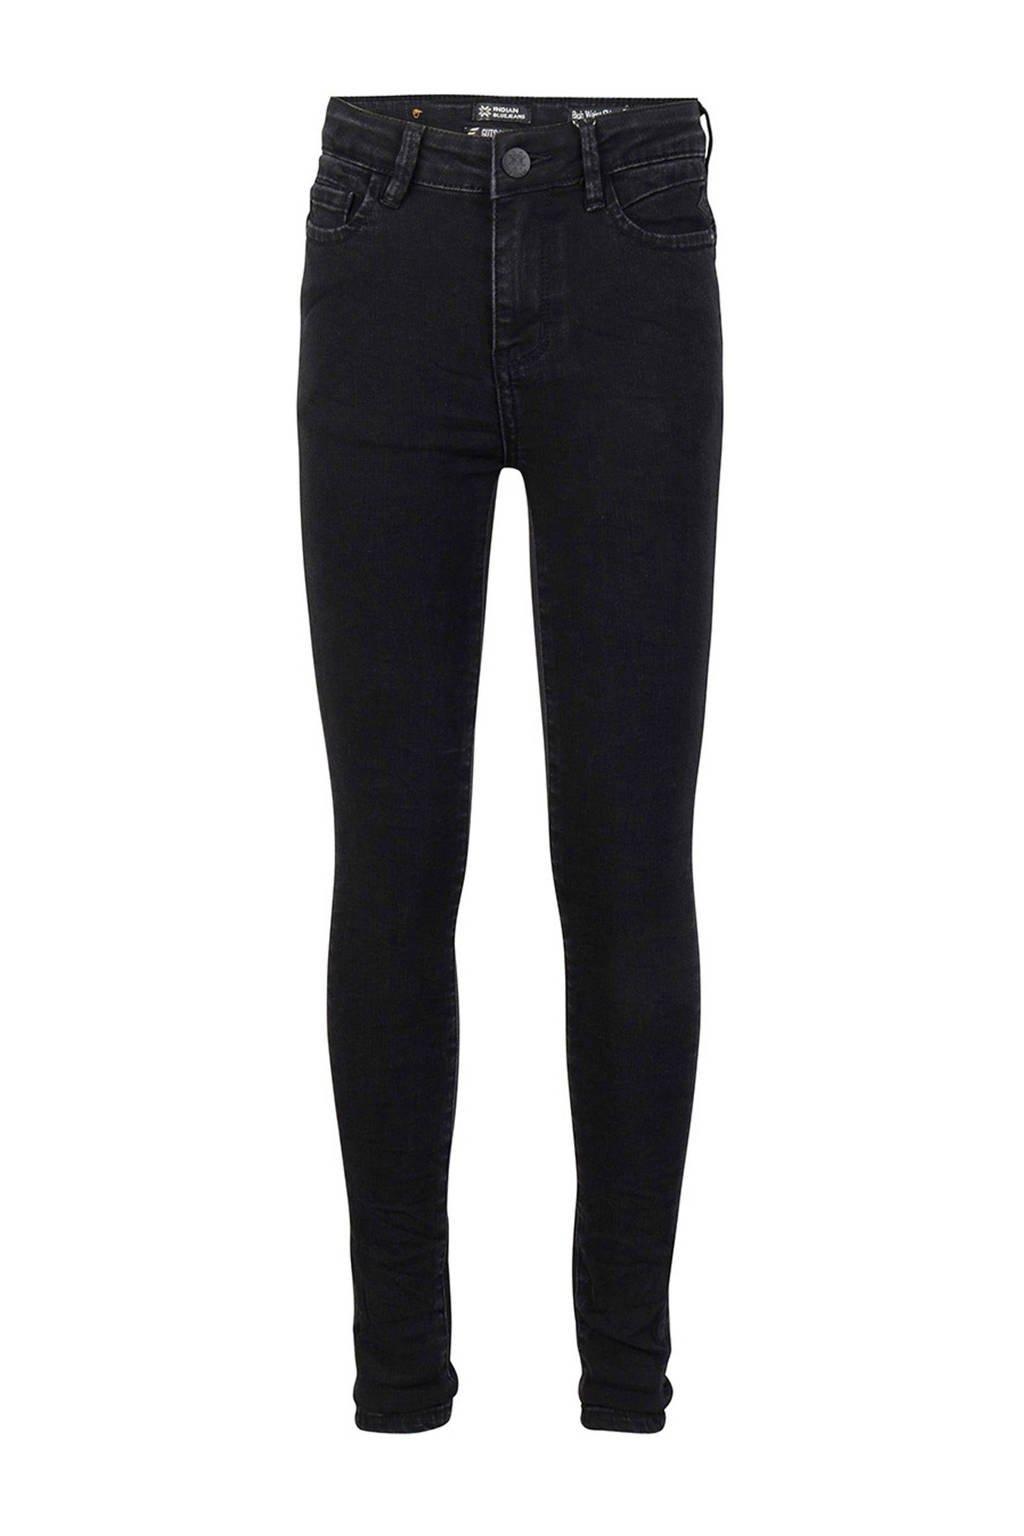 Indian Blue Jeans high waist skinny jeans Lois black denim, Black denim